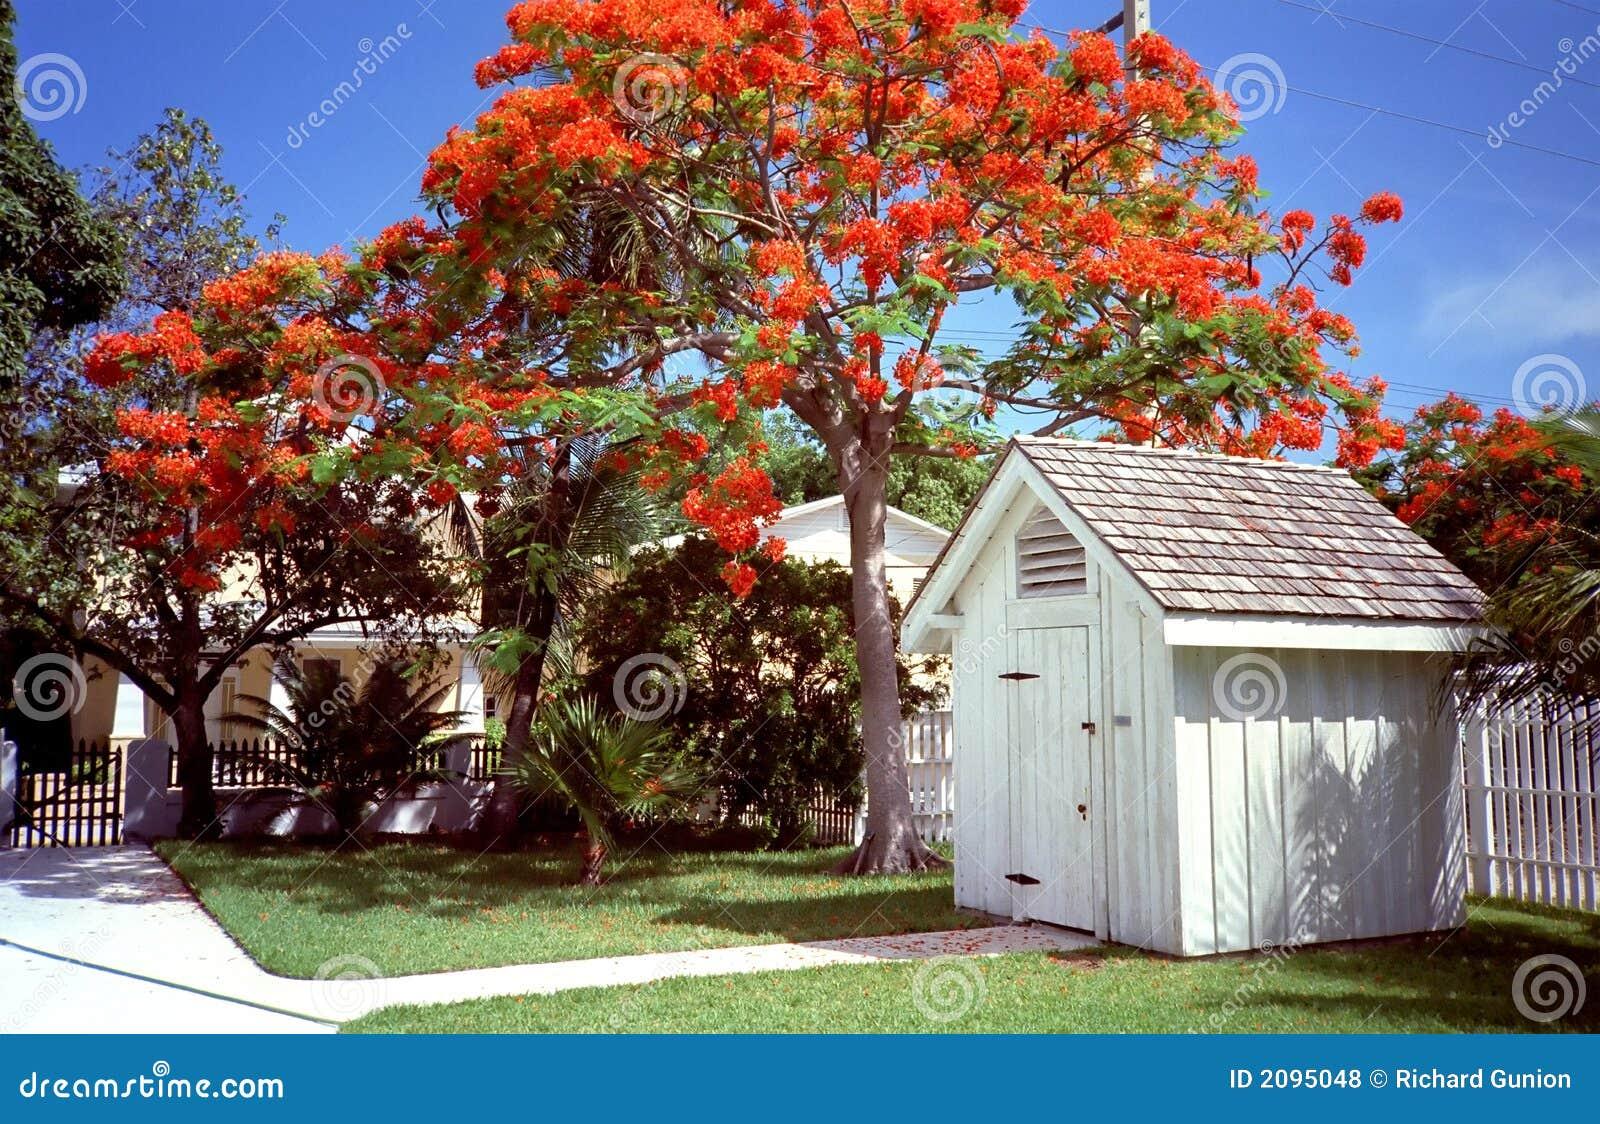 Key West Jacarandatree Stock Photo Image Of Blue Lawn 2095048